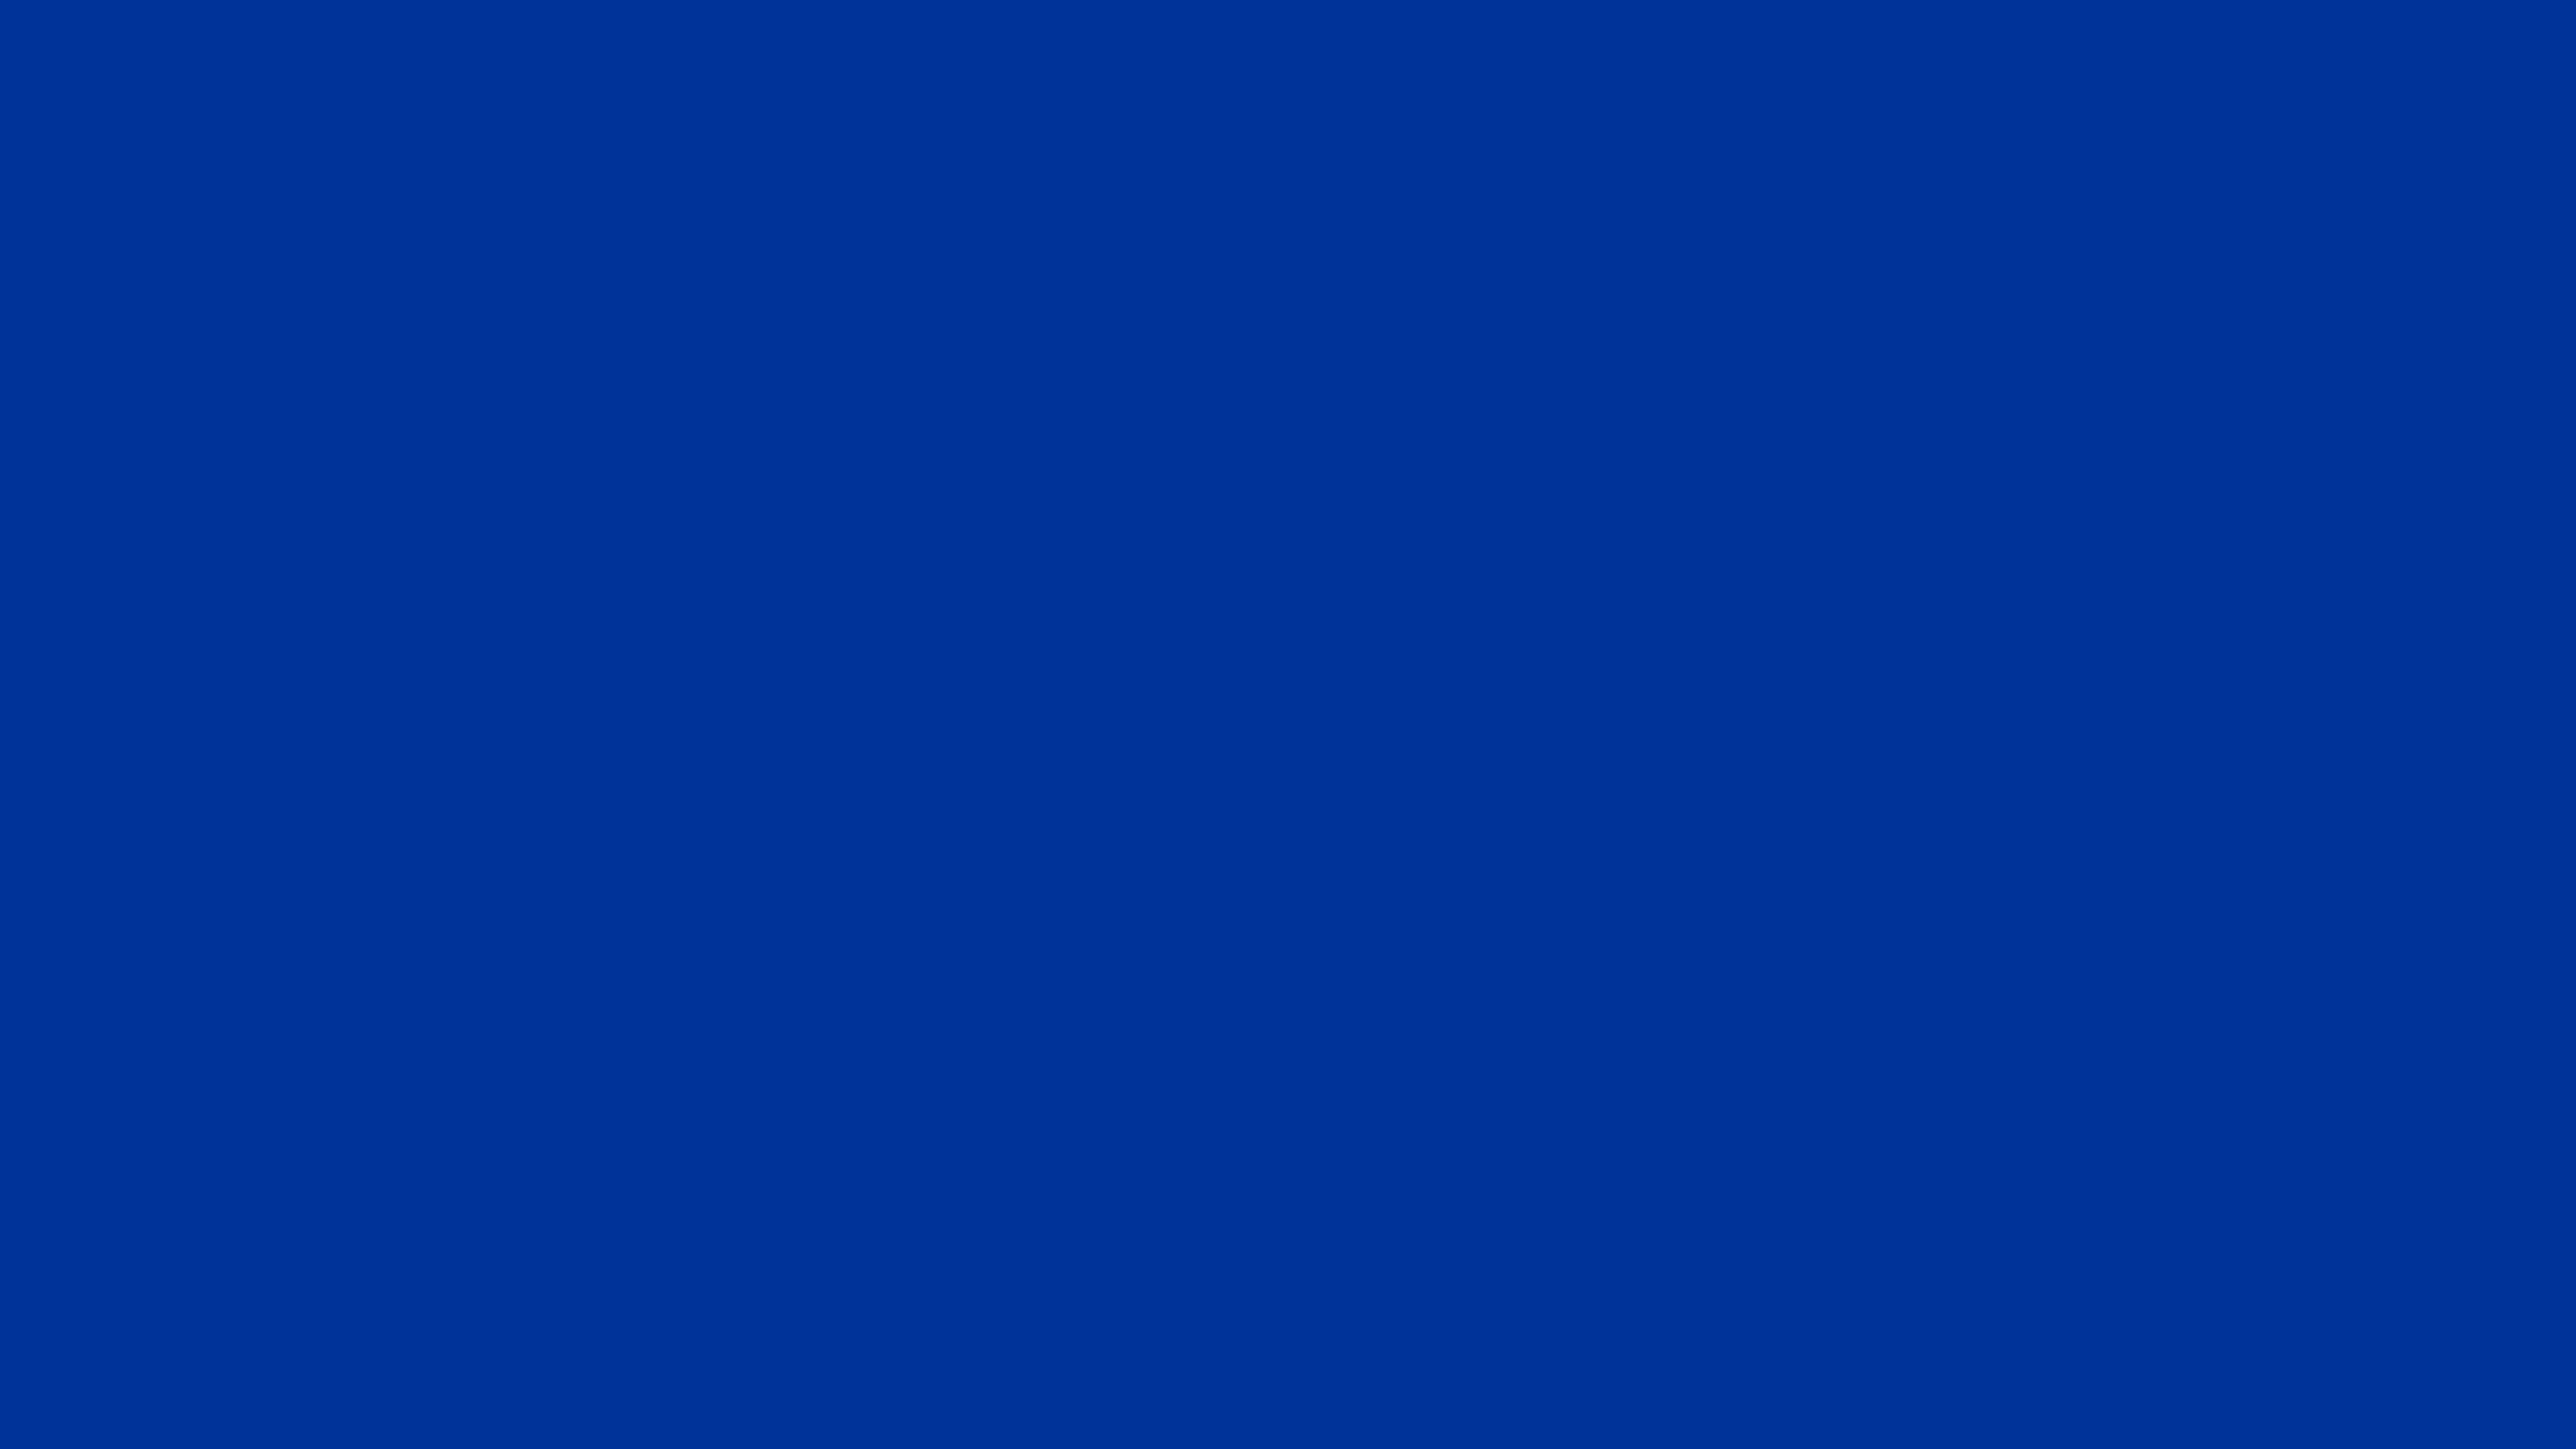 3840x2160 Dark Powder Blue Solid Color Background